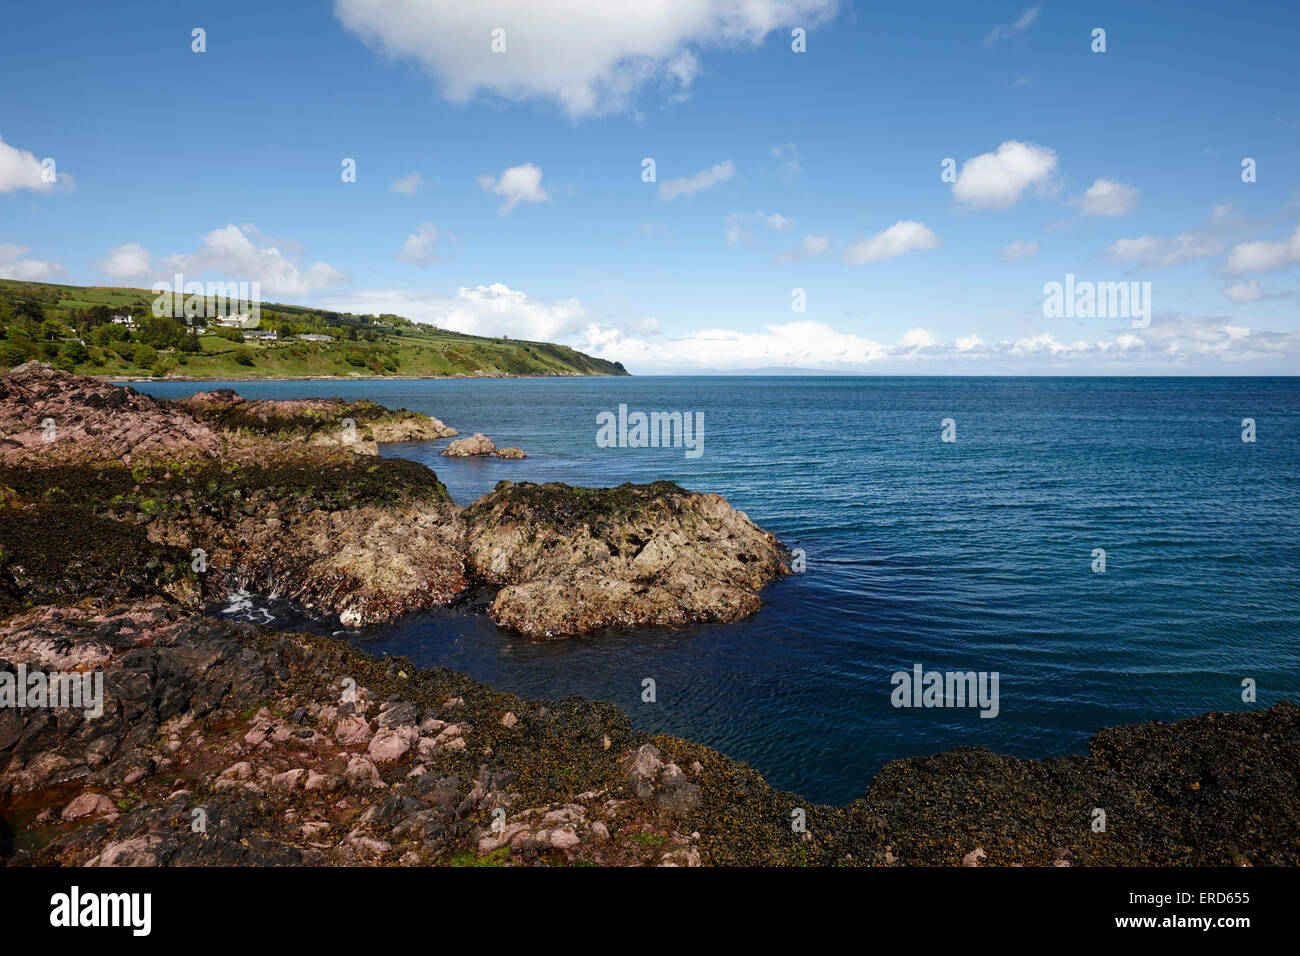 promontory pink dacite rocks at limerick point Cushendall County Antrim Northern Ireland UK - Stock Image